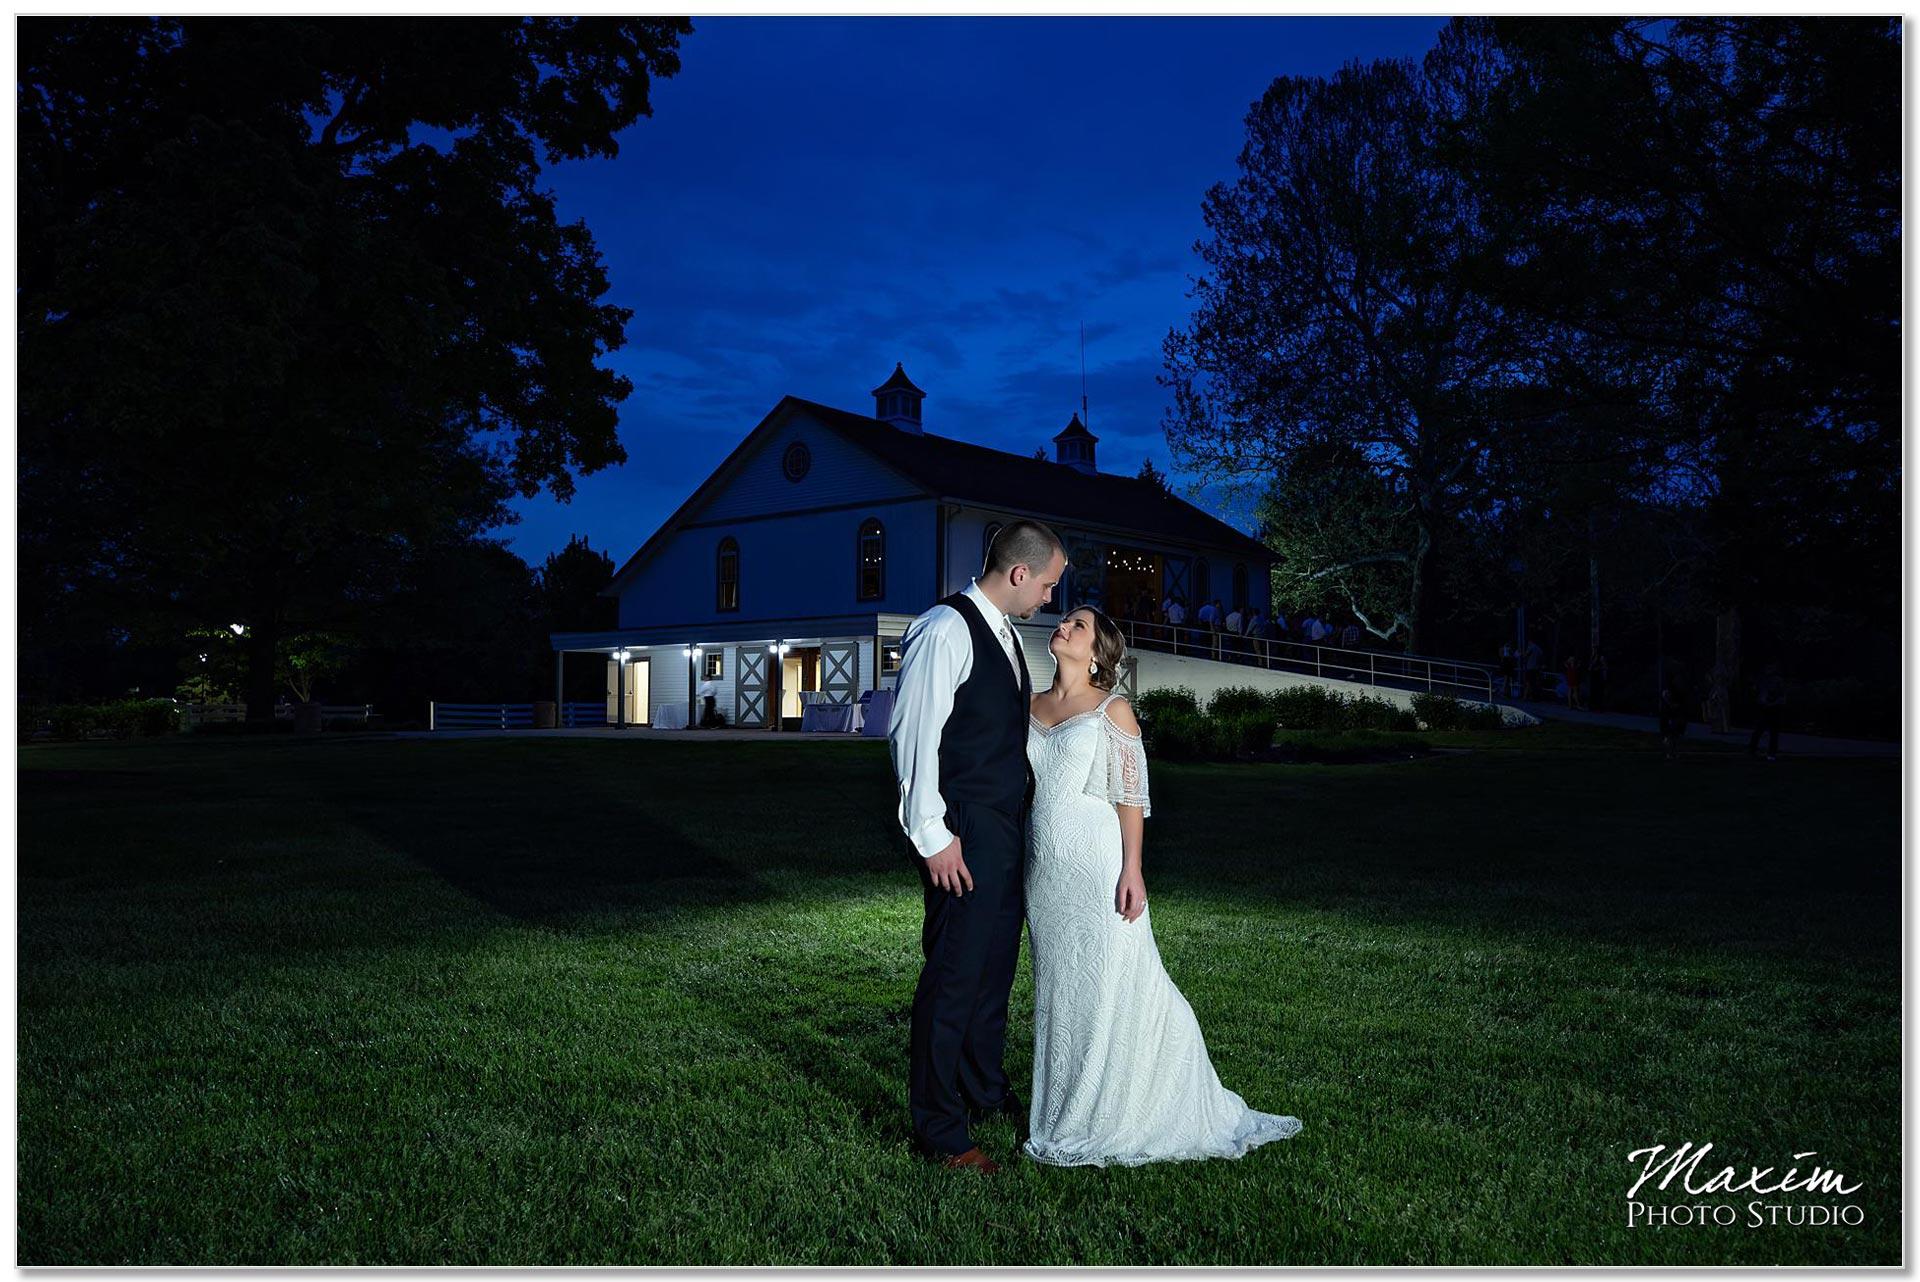 Night sunset image bride groom Polen Farm